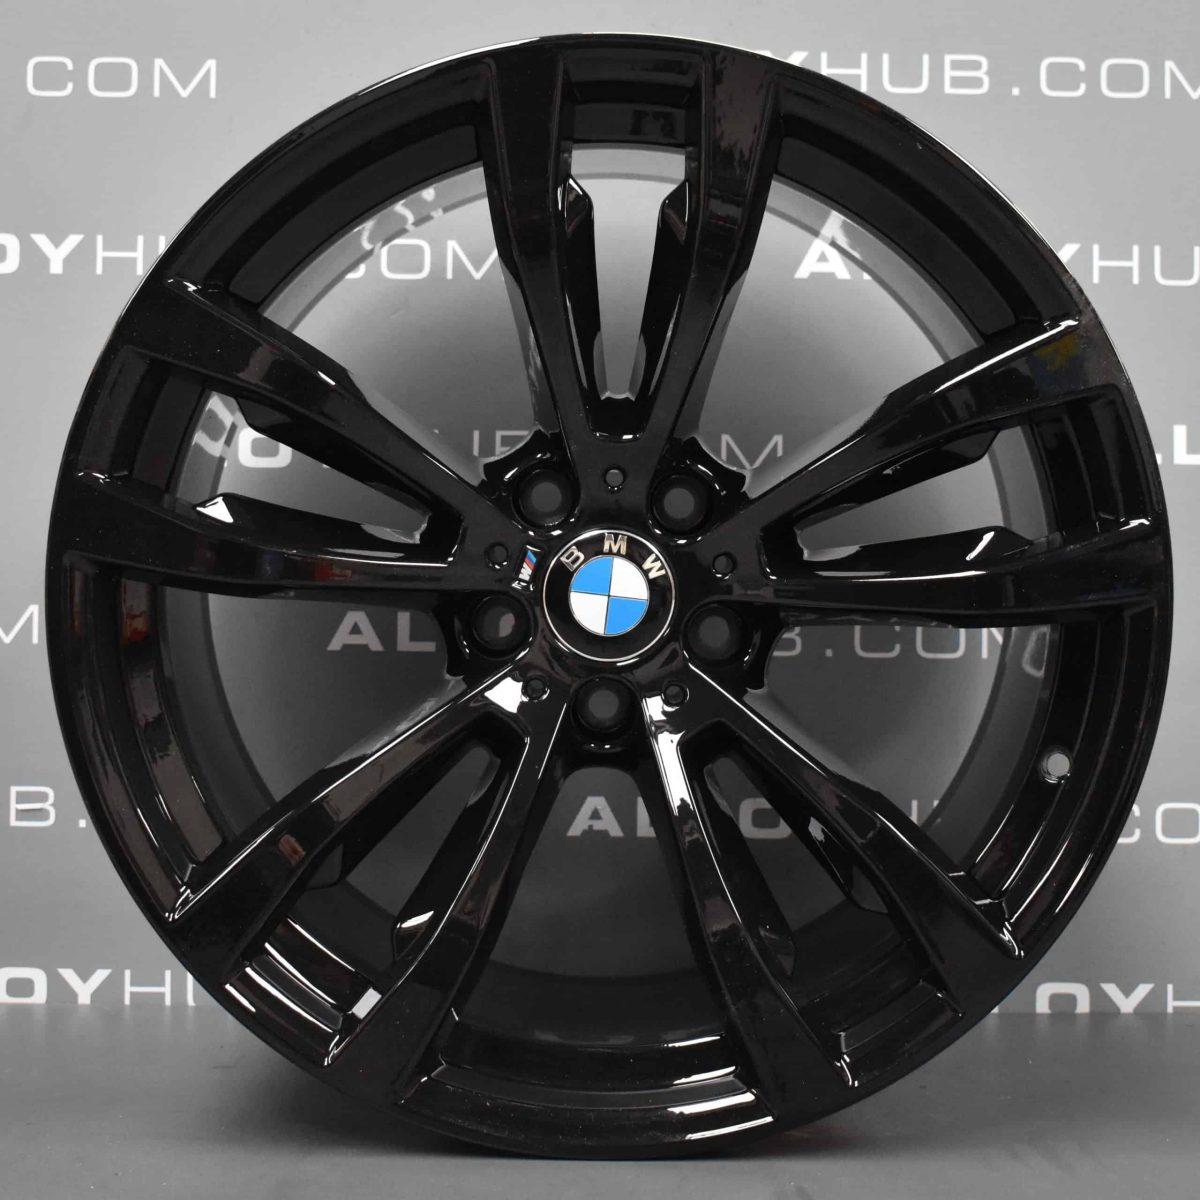 Genuine BMW X5 X6 F15 F16 Style 469M Sport 20″ inch 5 Twin Spoke Alloy Wheels with Gloss Black Finish 36117846790 36117846791